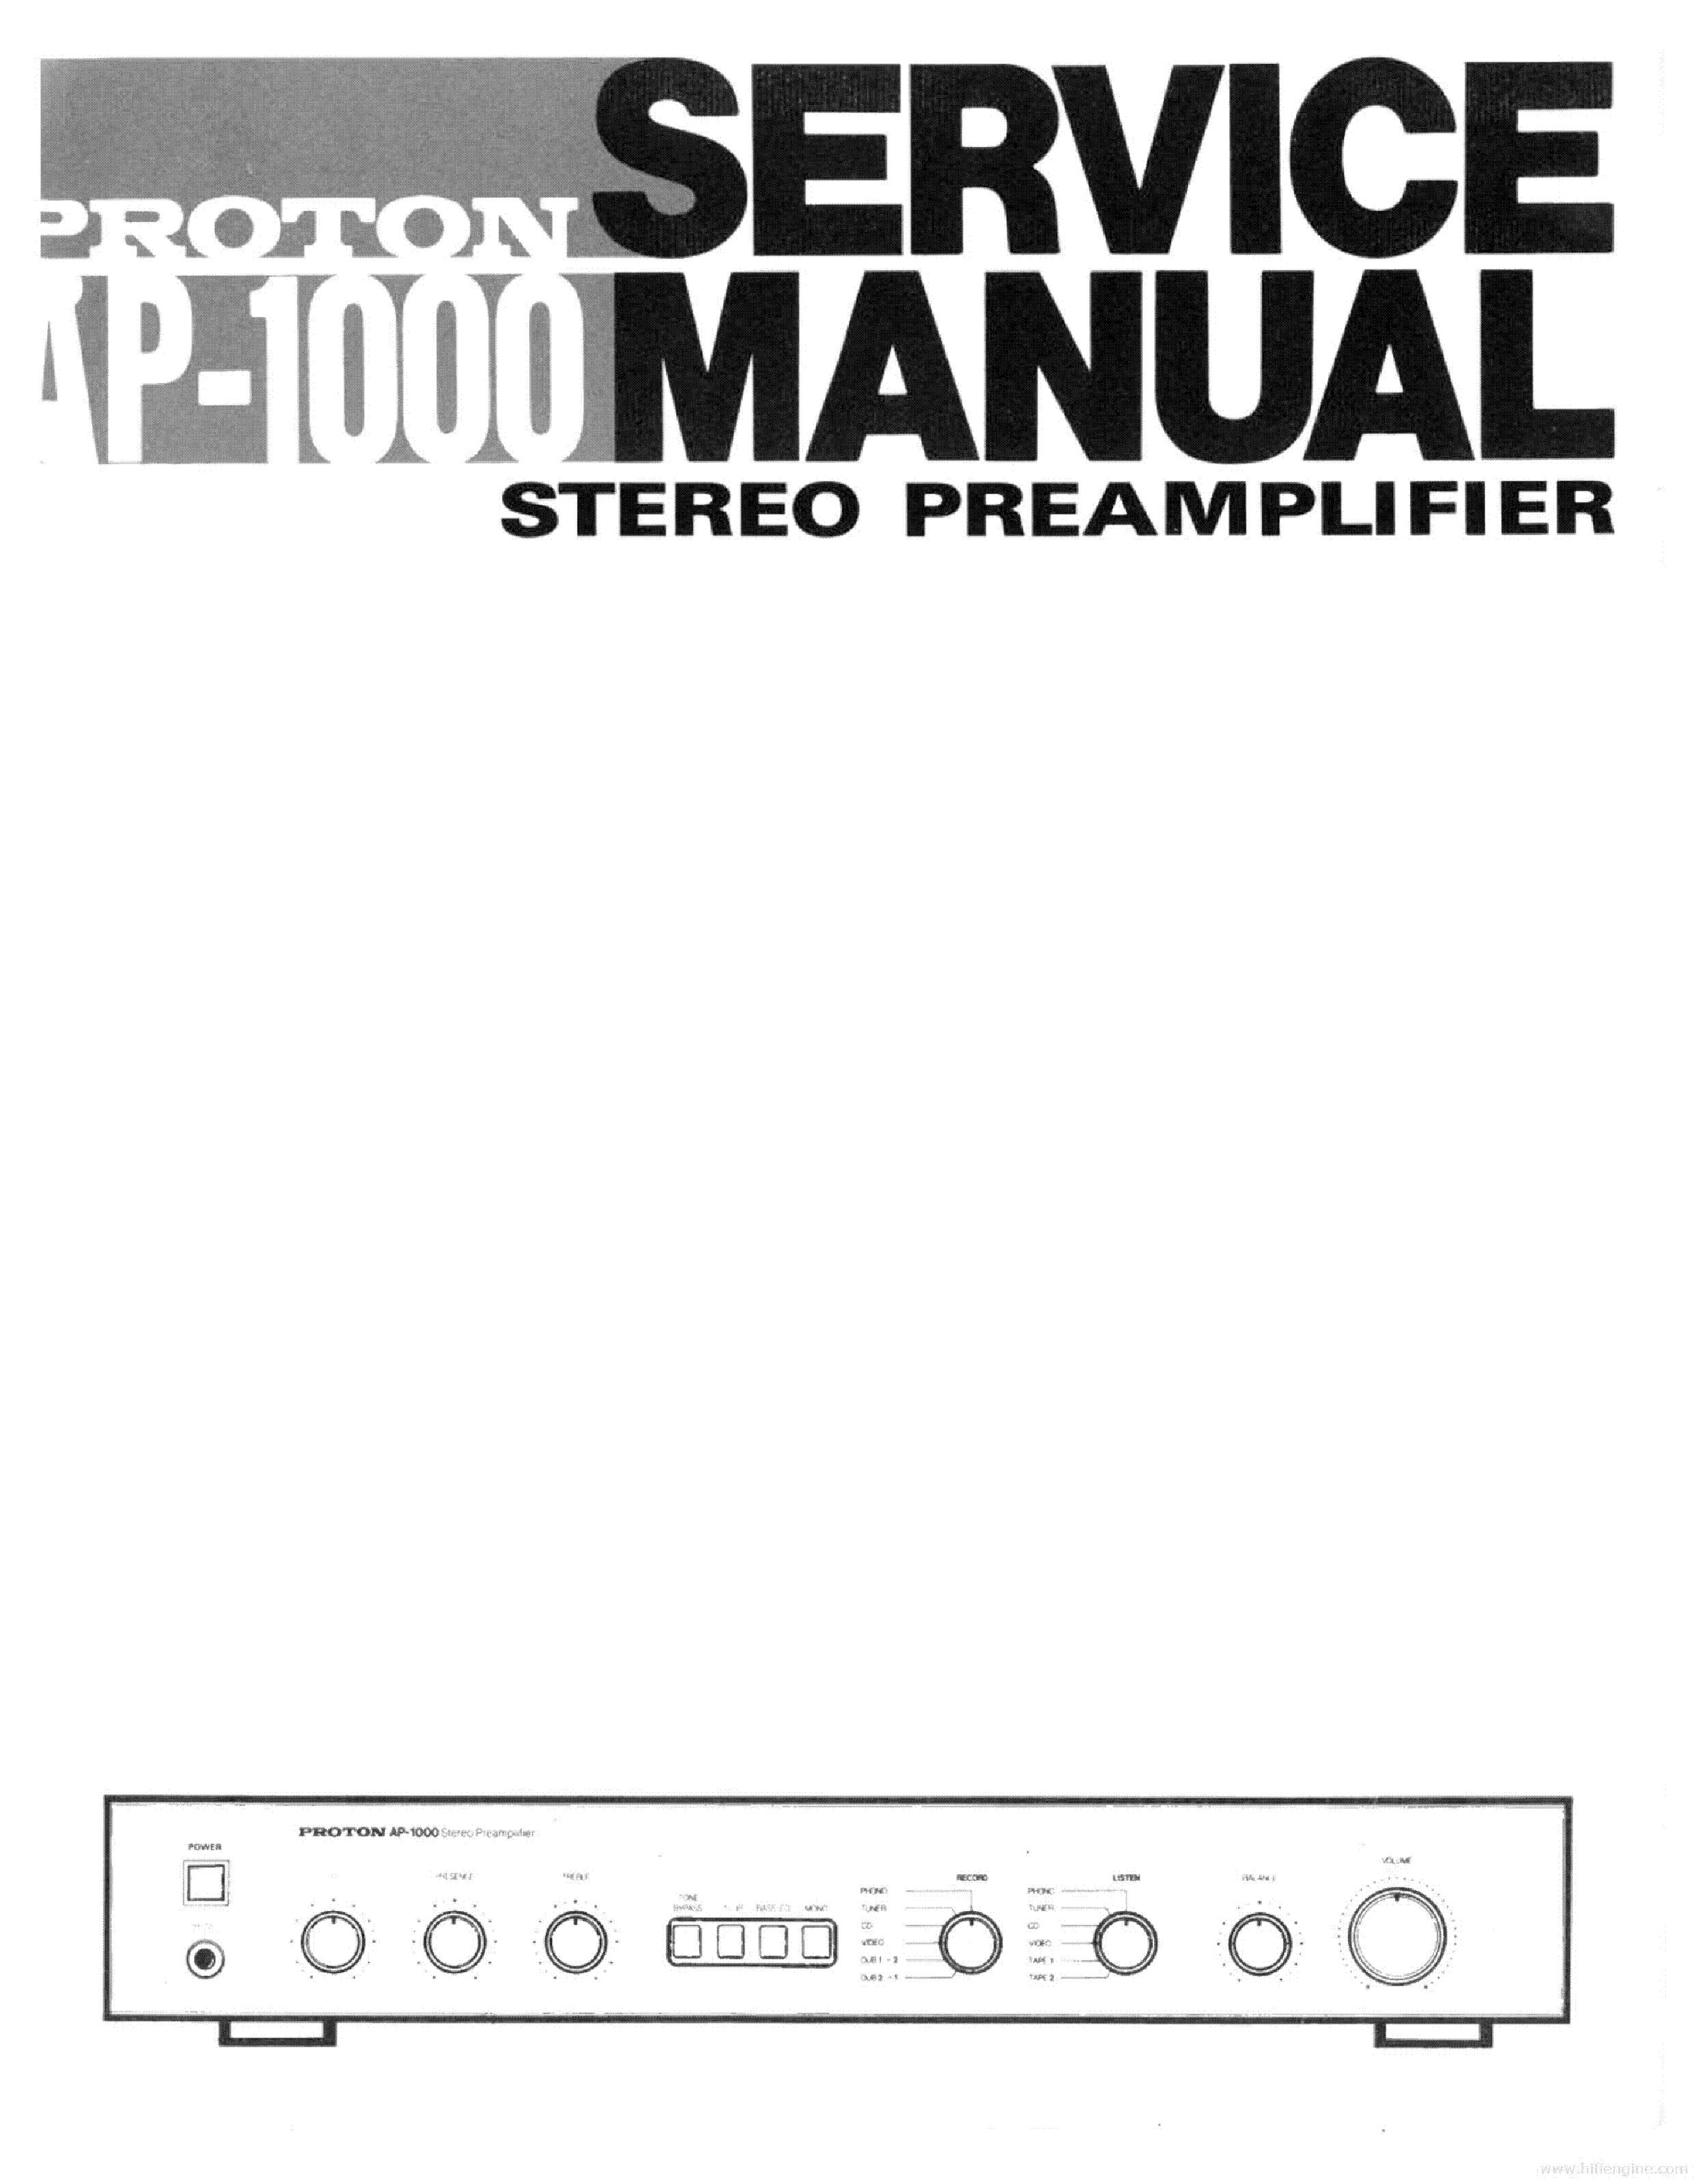 proton ap 1000 service manual download schematics eeprom repair rh elektrotanya com proton wira repair manual pdf proton wira repair manual pdf